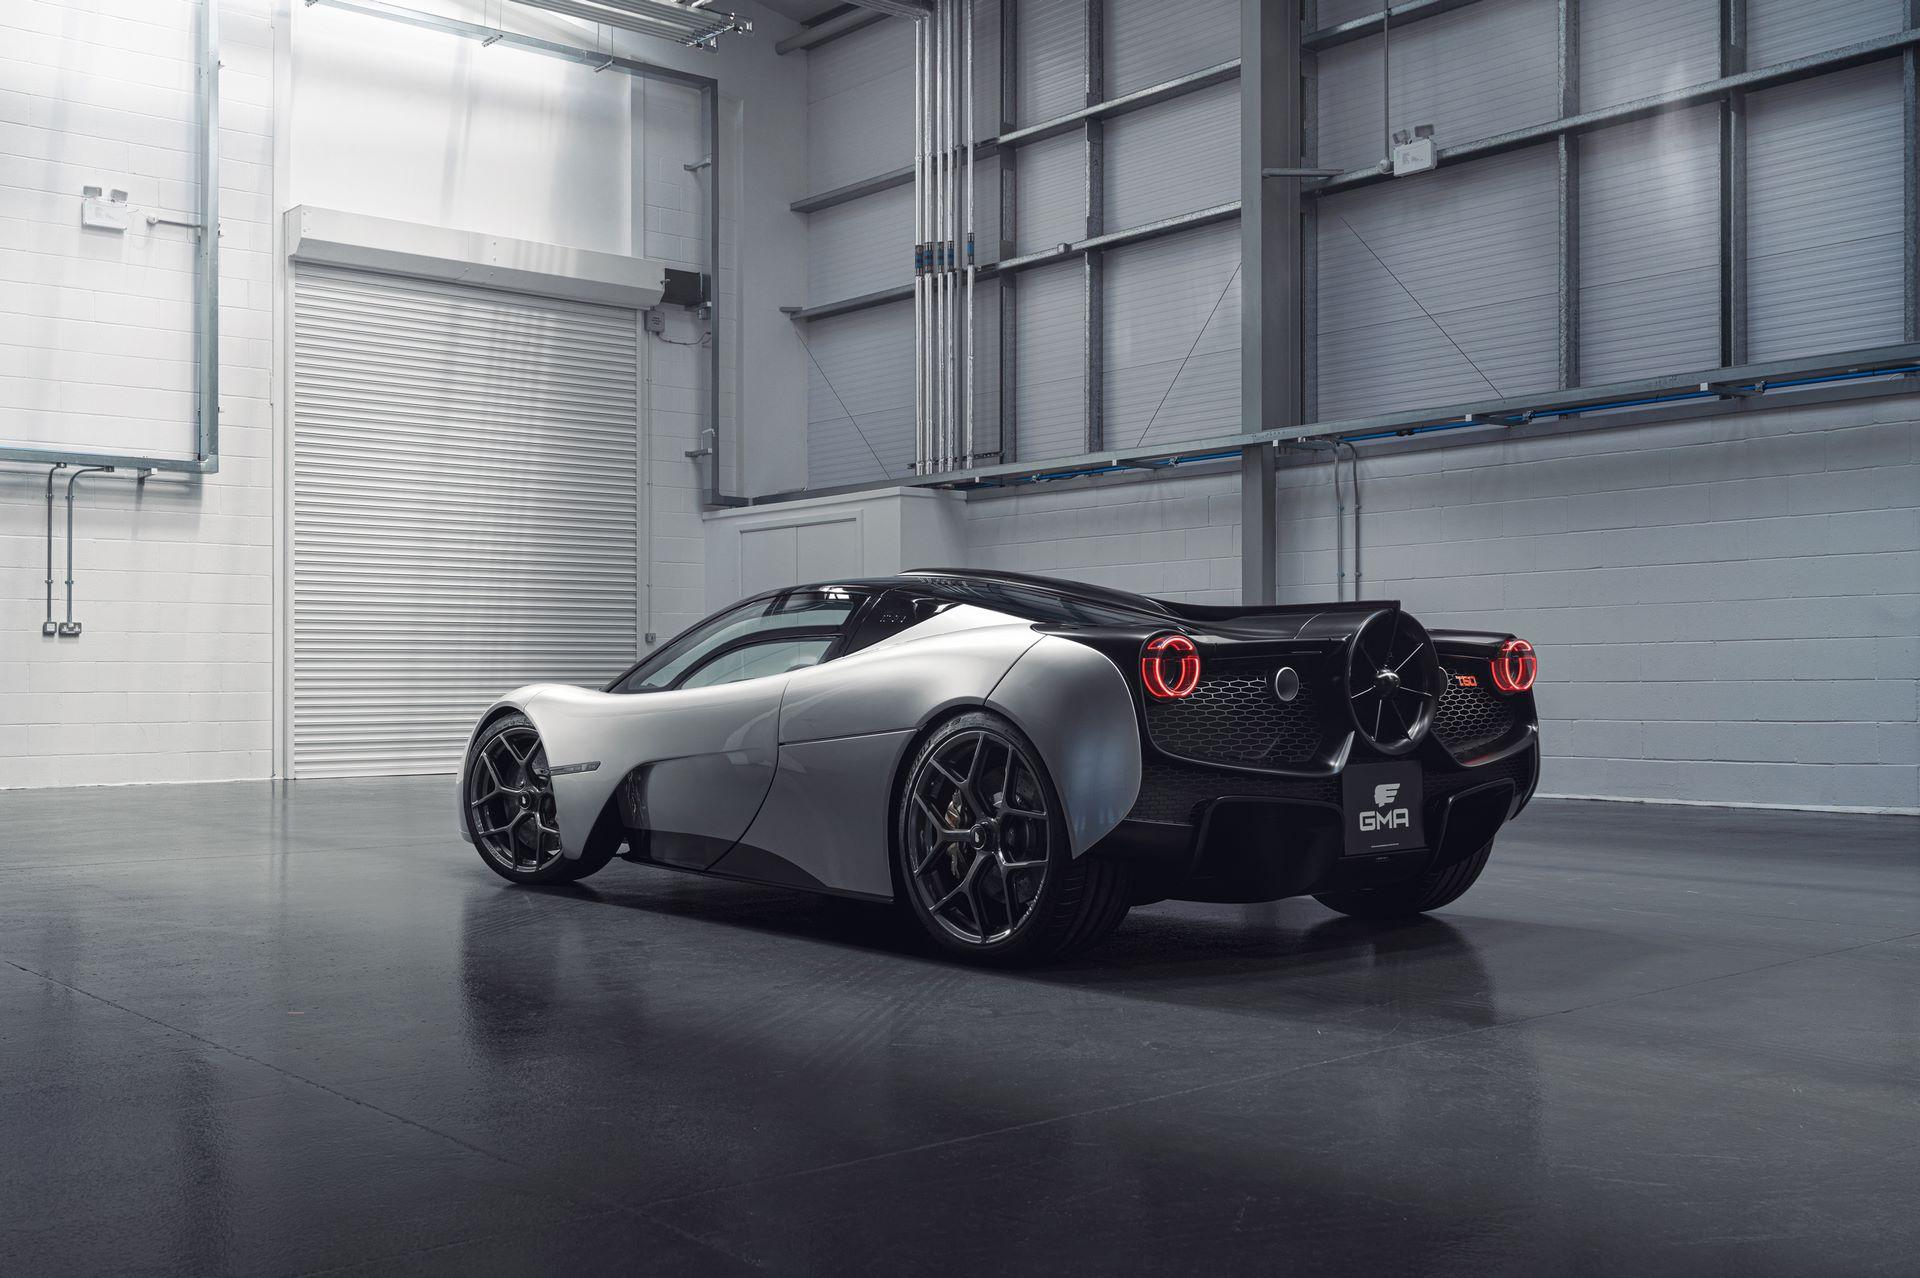 Gordon-Murray-Automotive-GMA-T50-3